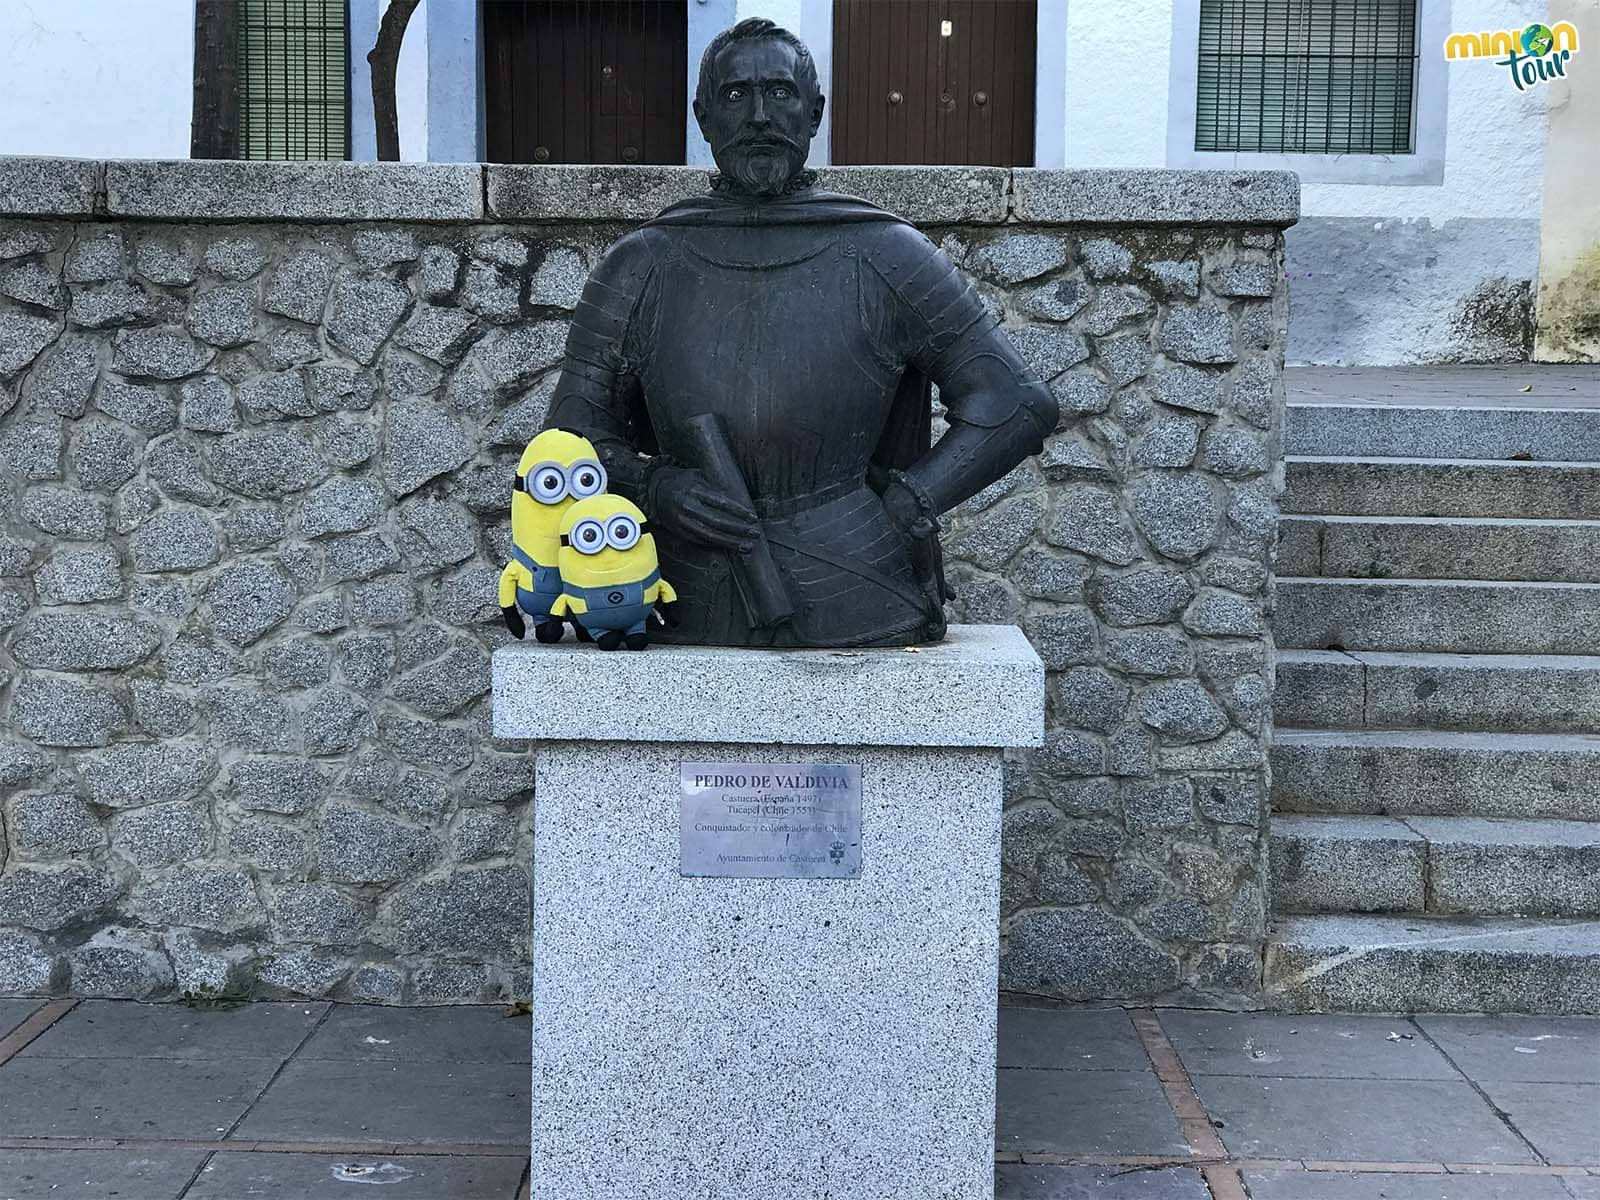 Minions posando con la estatua de Pedro de Valdivia en Castuera